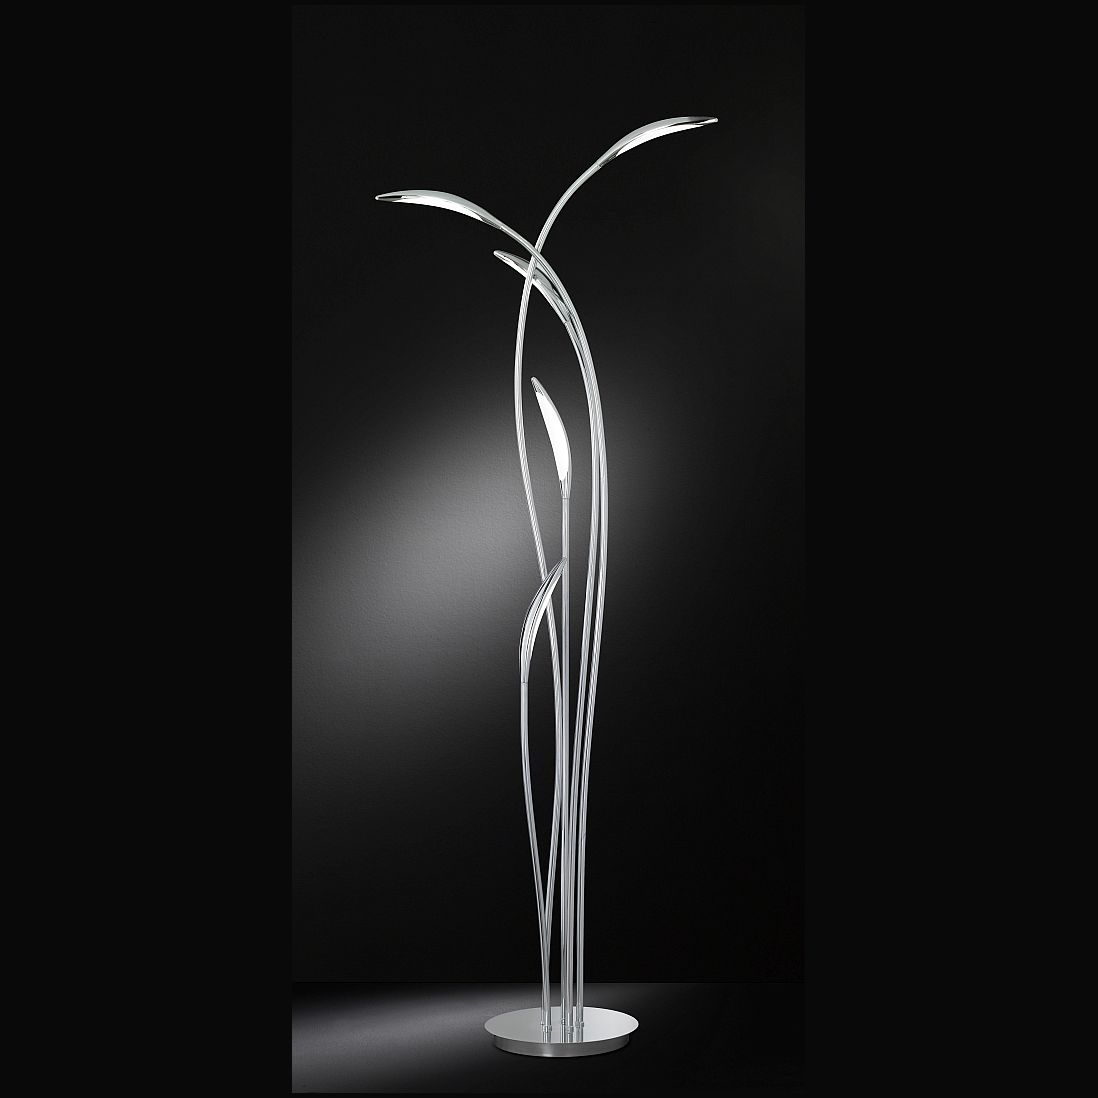 Led Stehlampe In Organischem Design